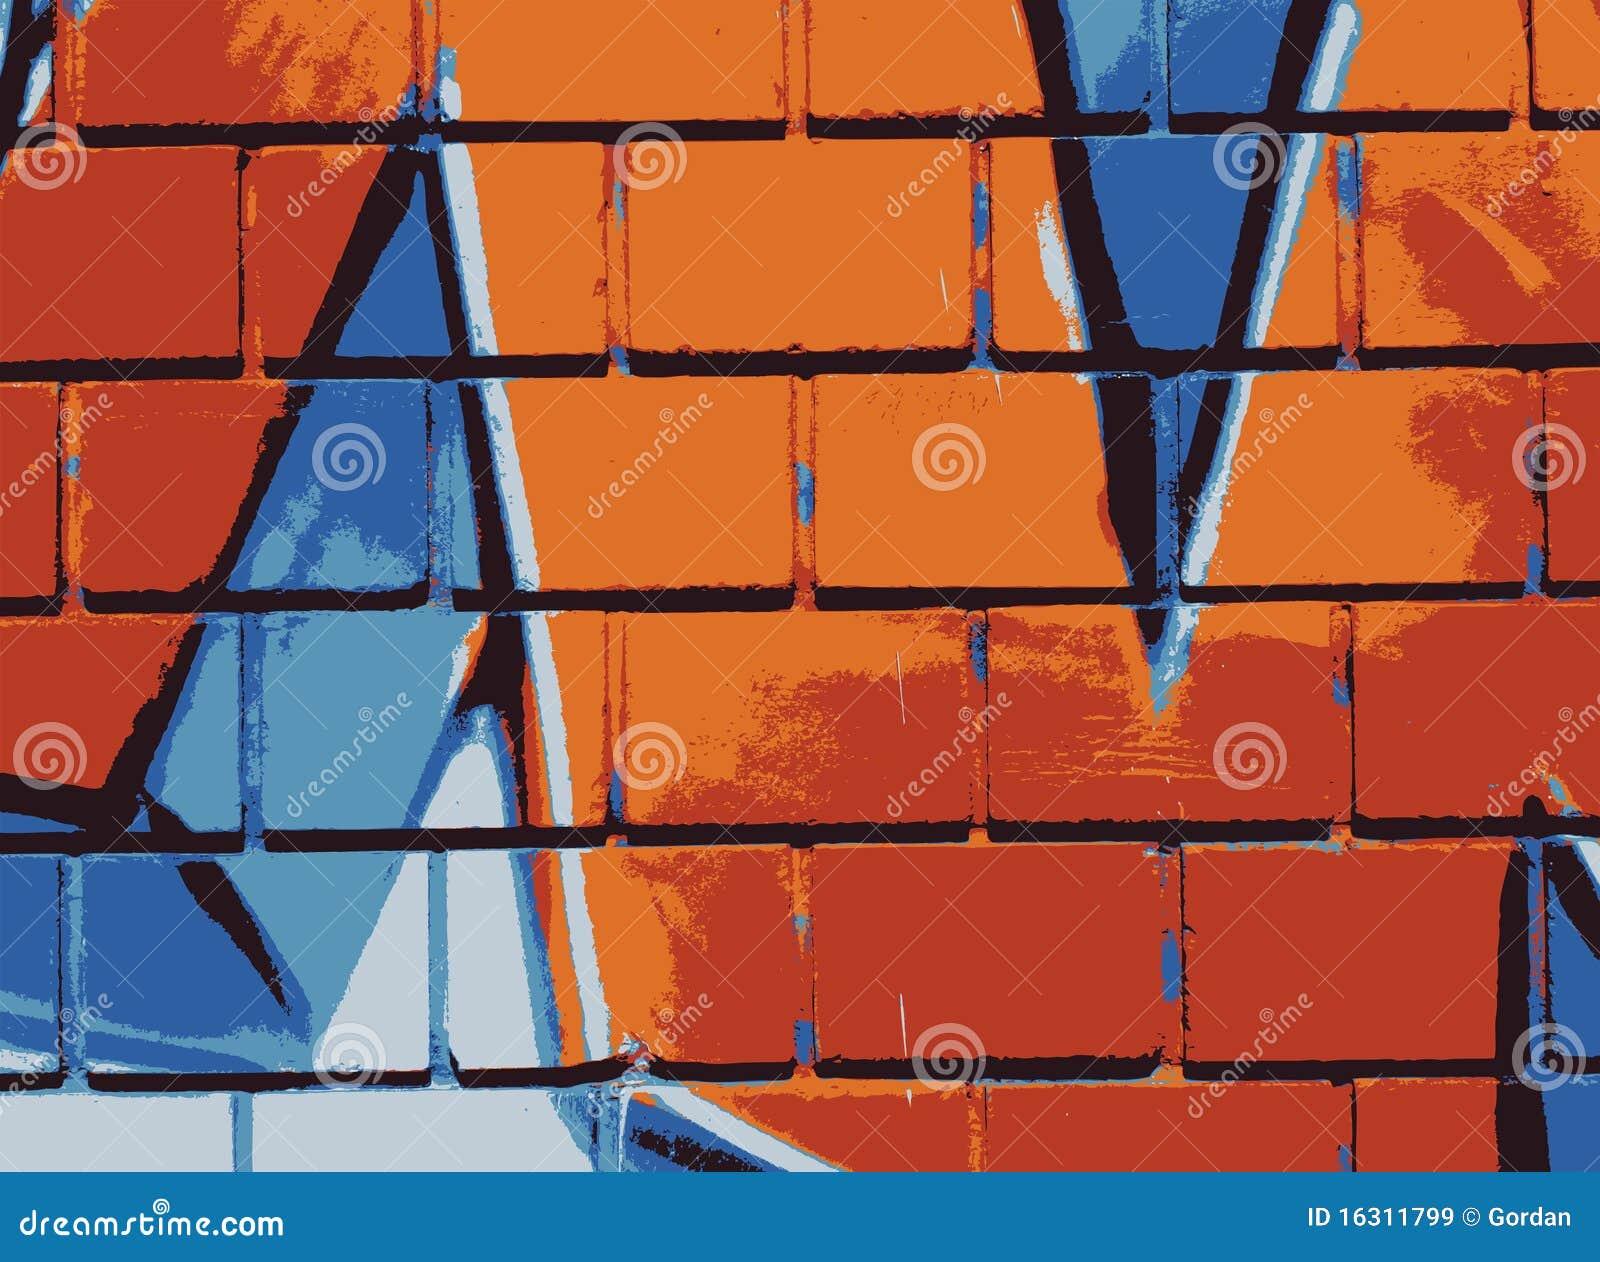 Graffiti wall vector free - Background Graffiti Illustration Wall